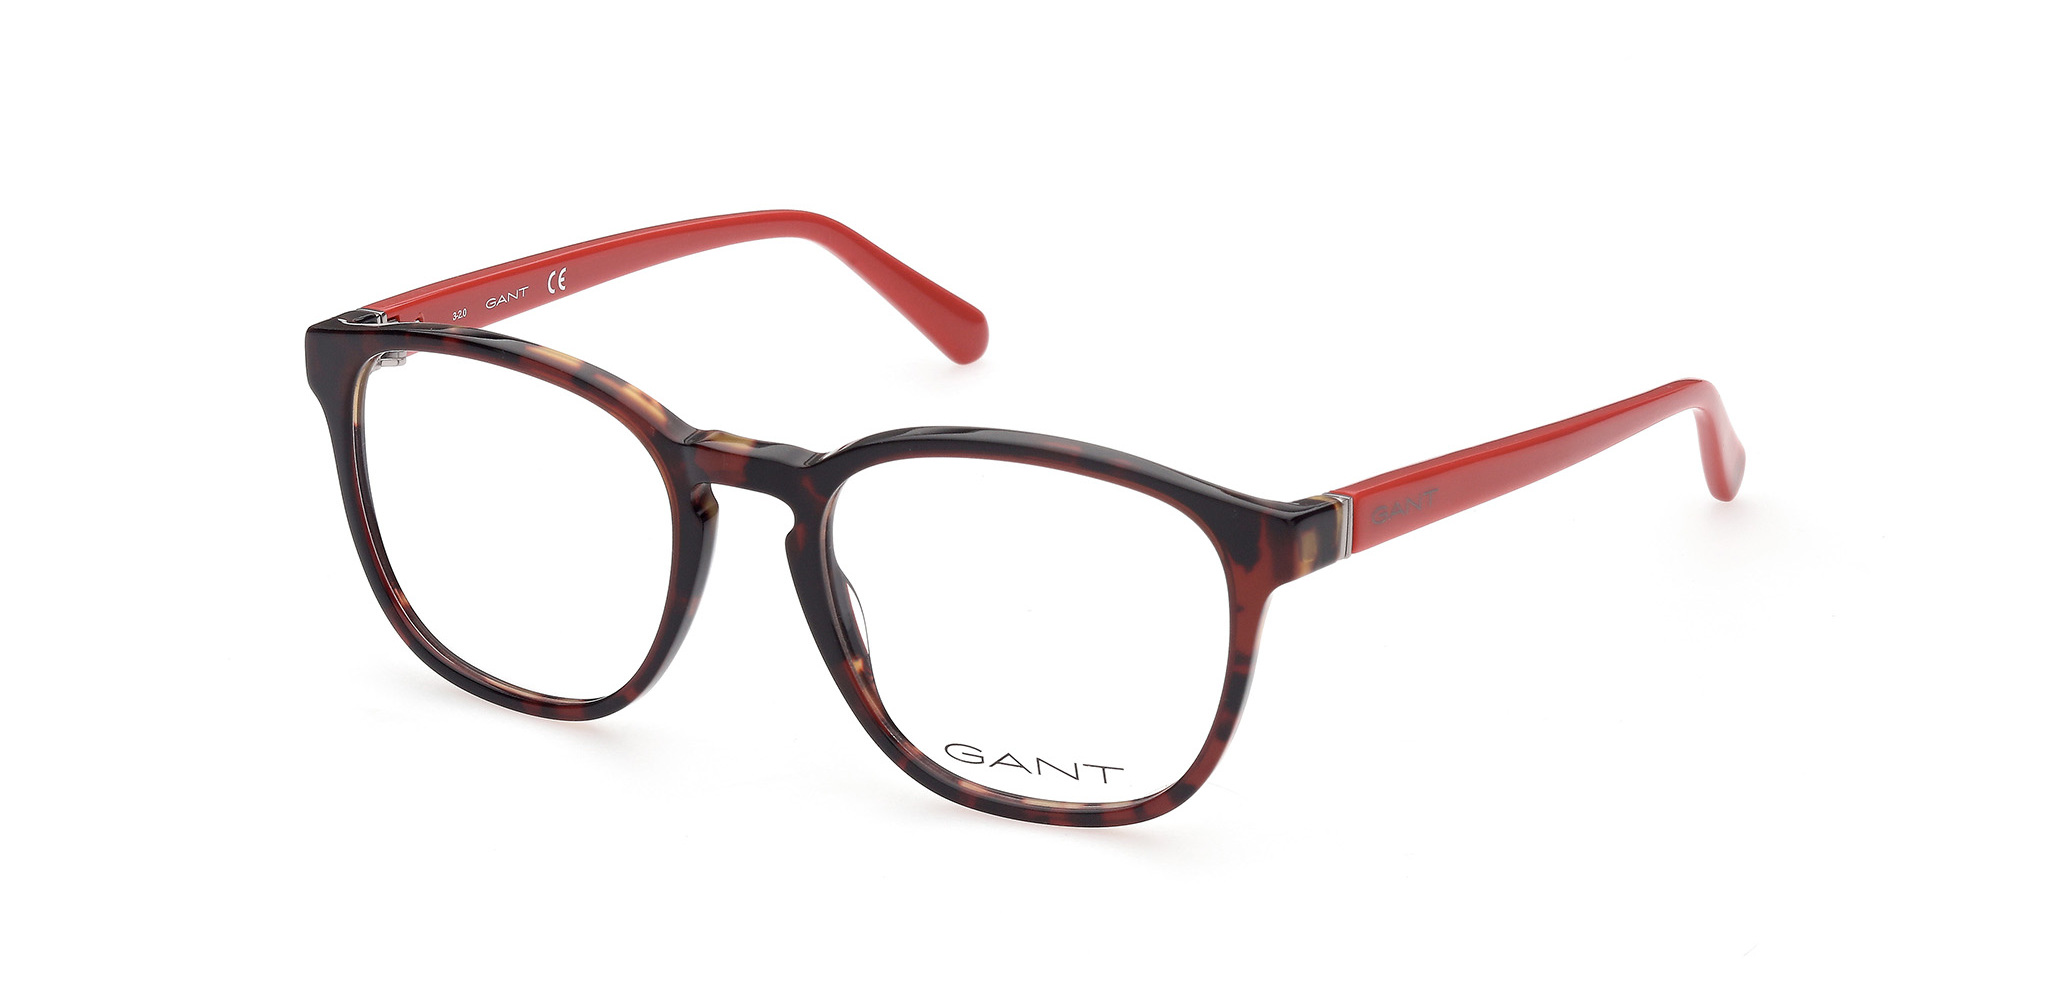 Gant Ga3245